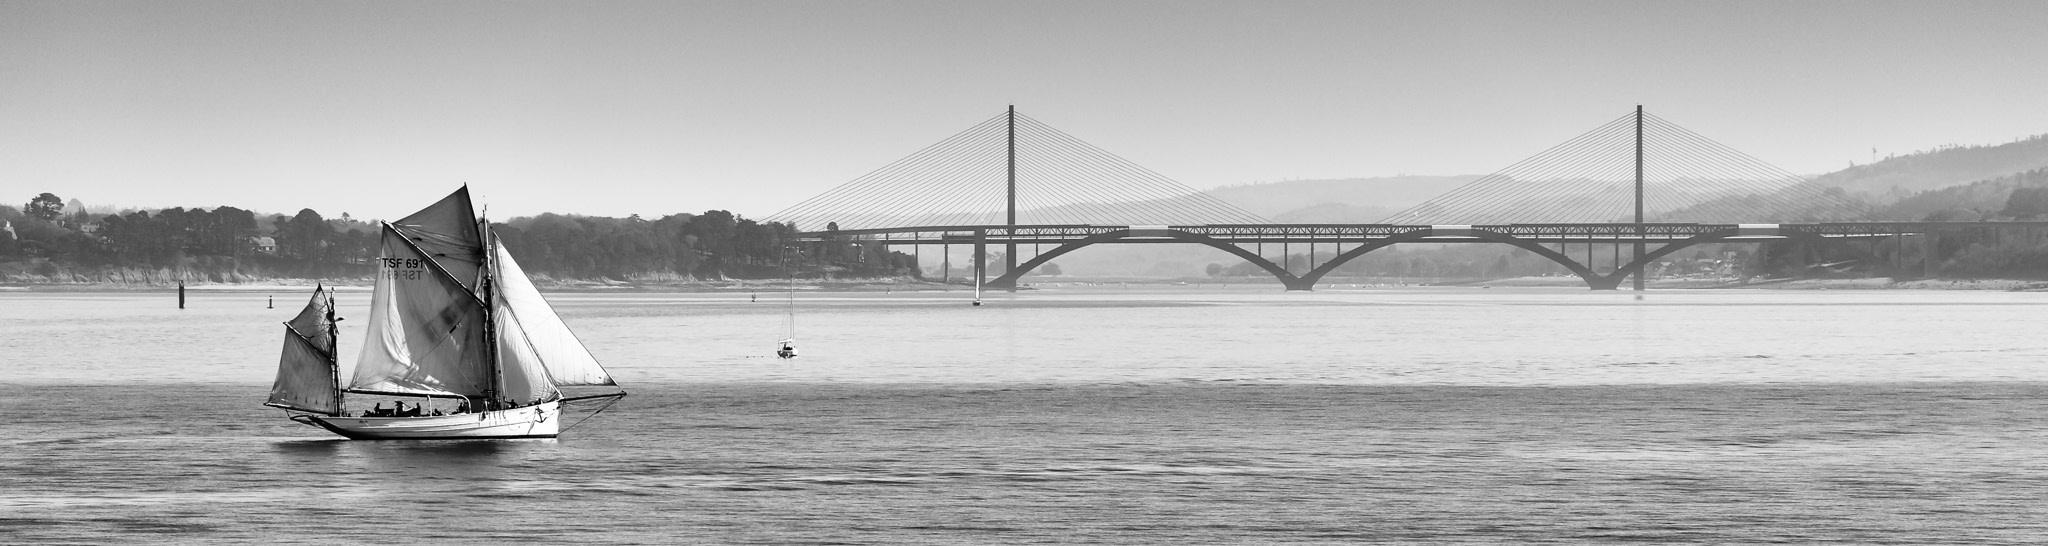 Photographie marine Brest Rade et marine et pont